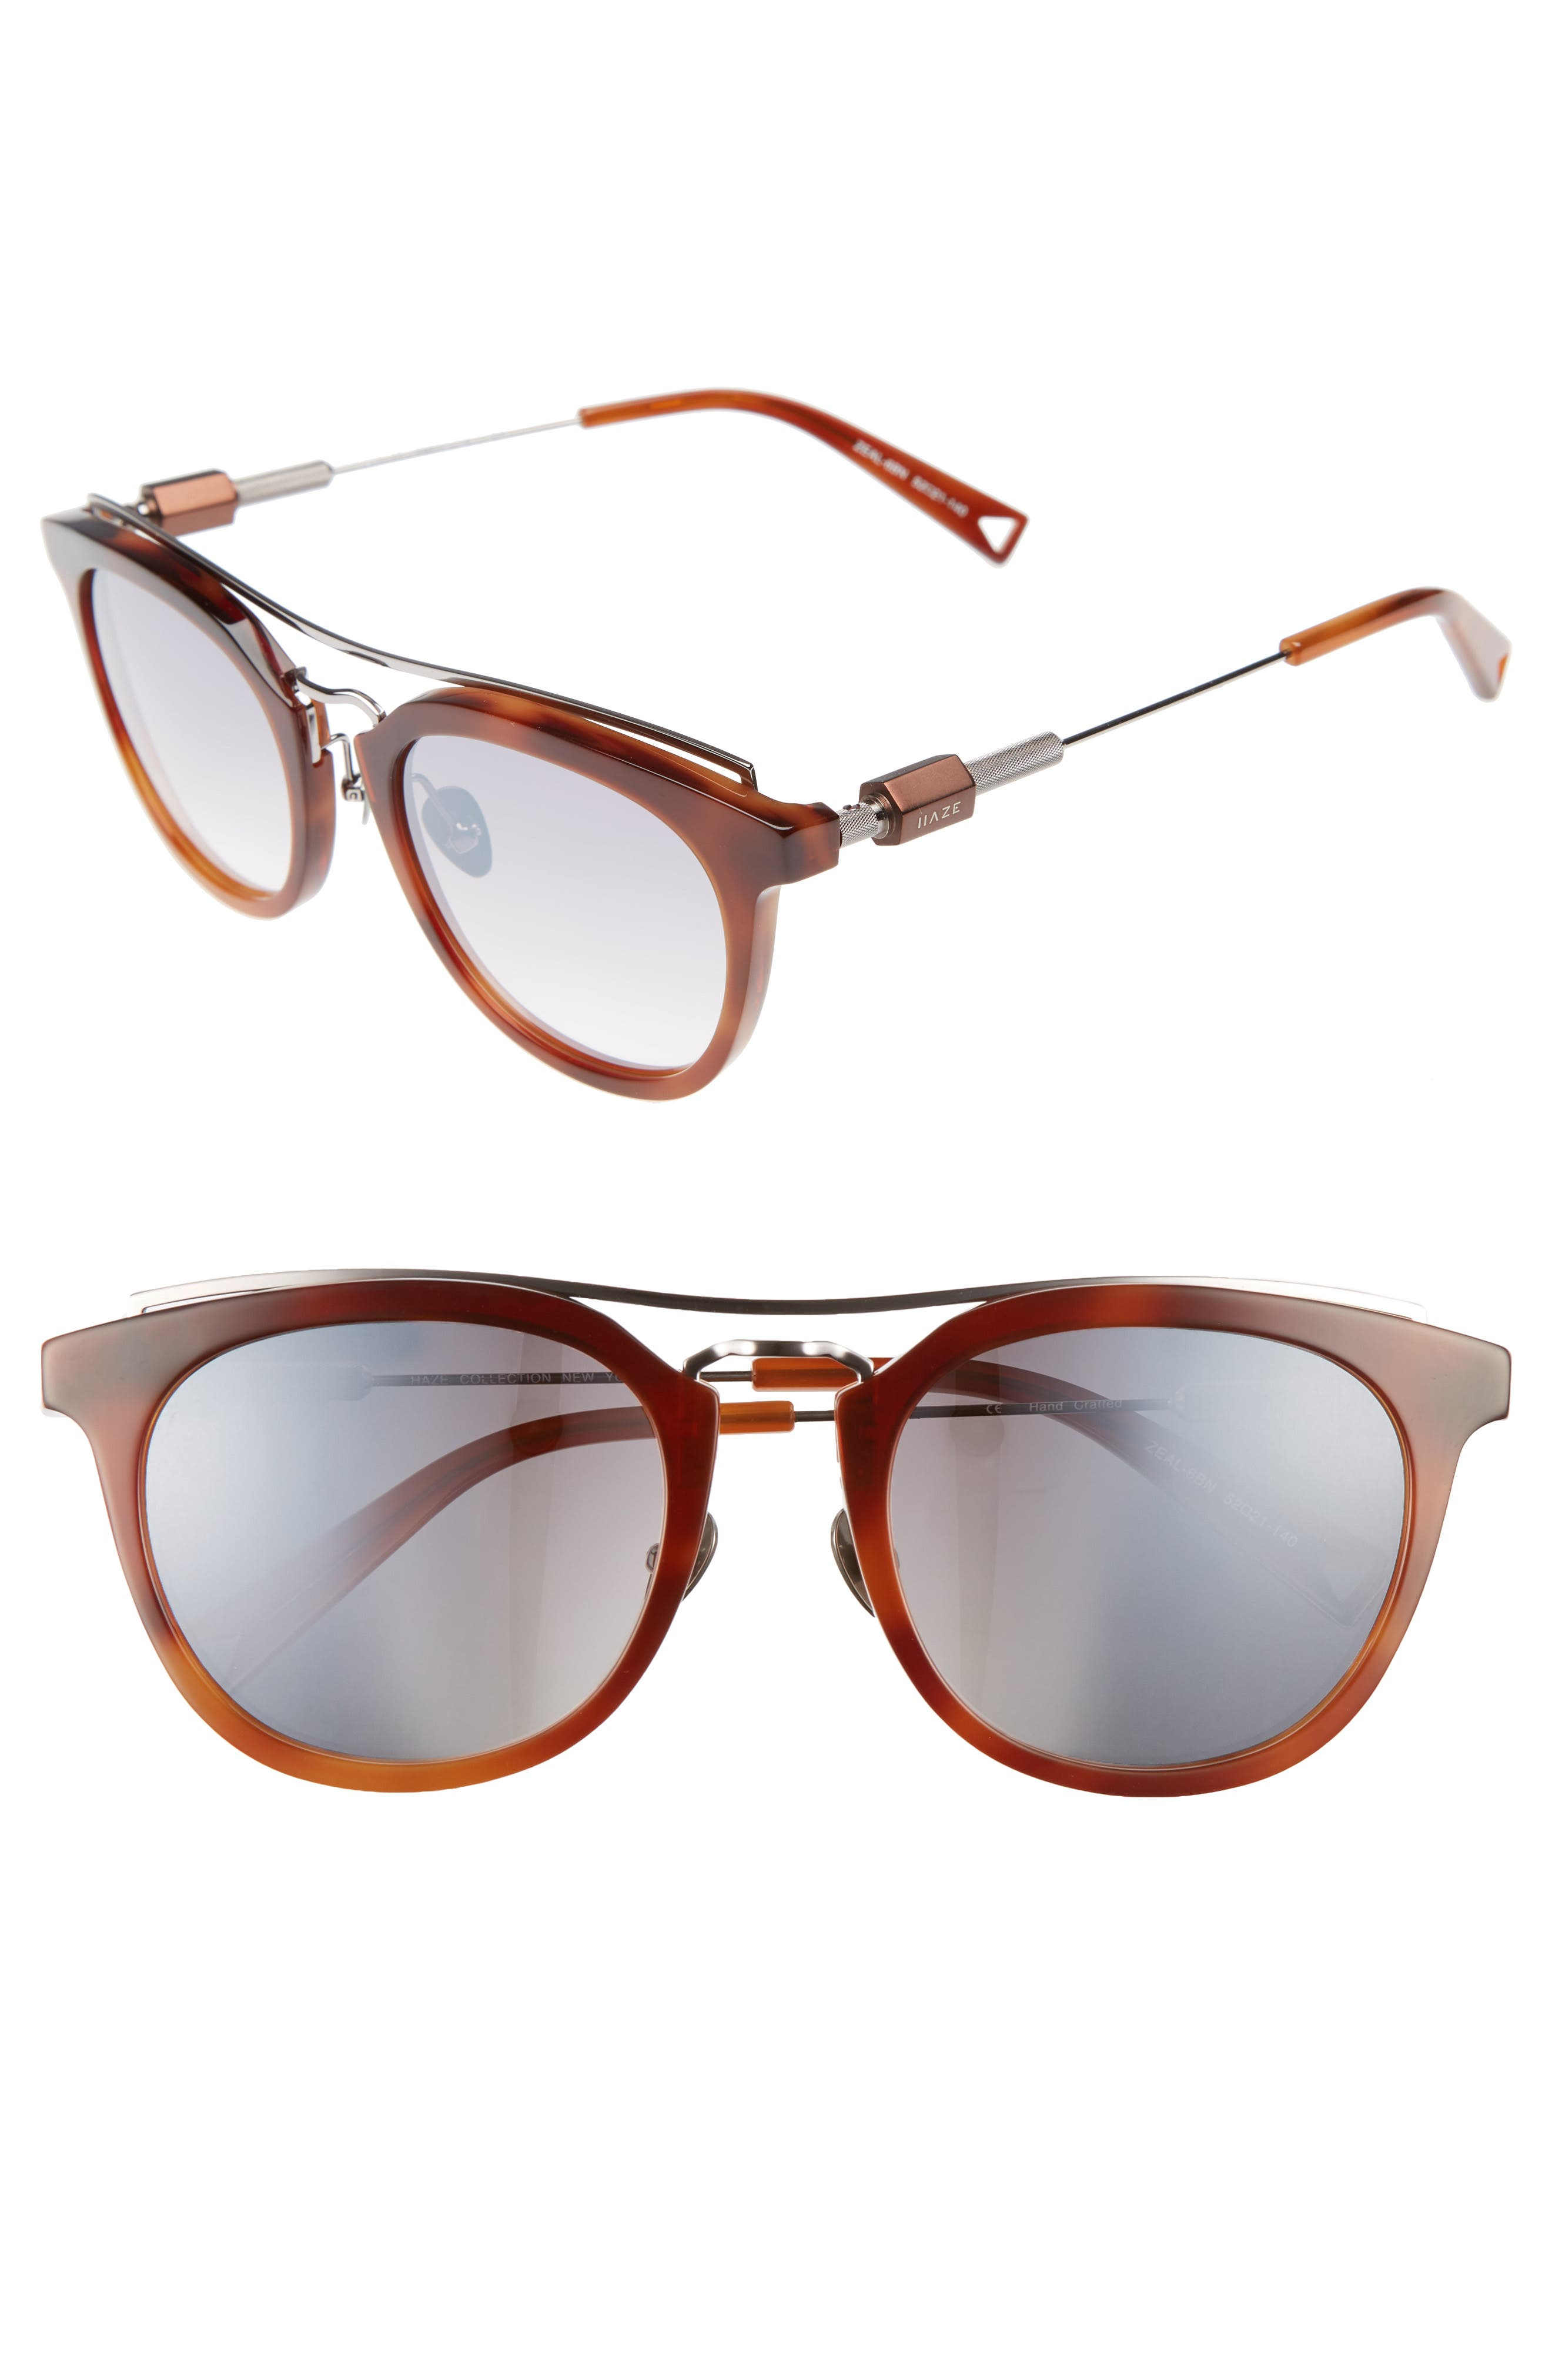 Zeal 52mm Aviator Sunglasses,                             Main thumbnail 1, color,                             Amber